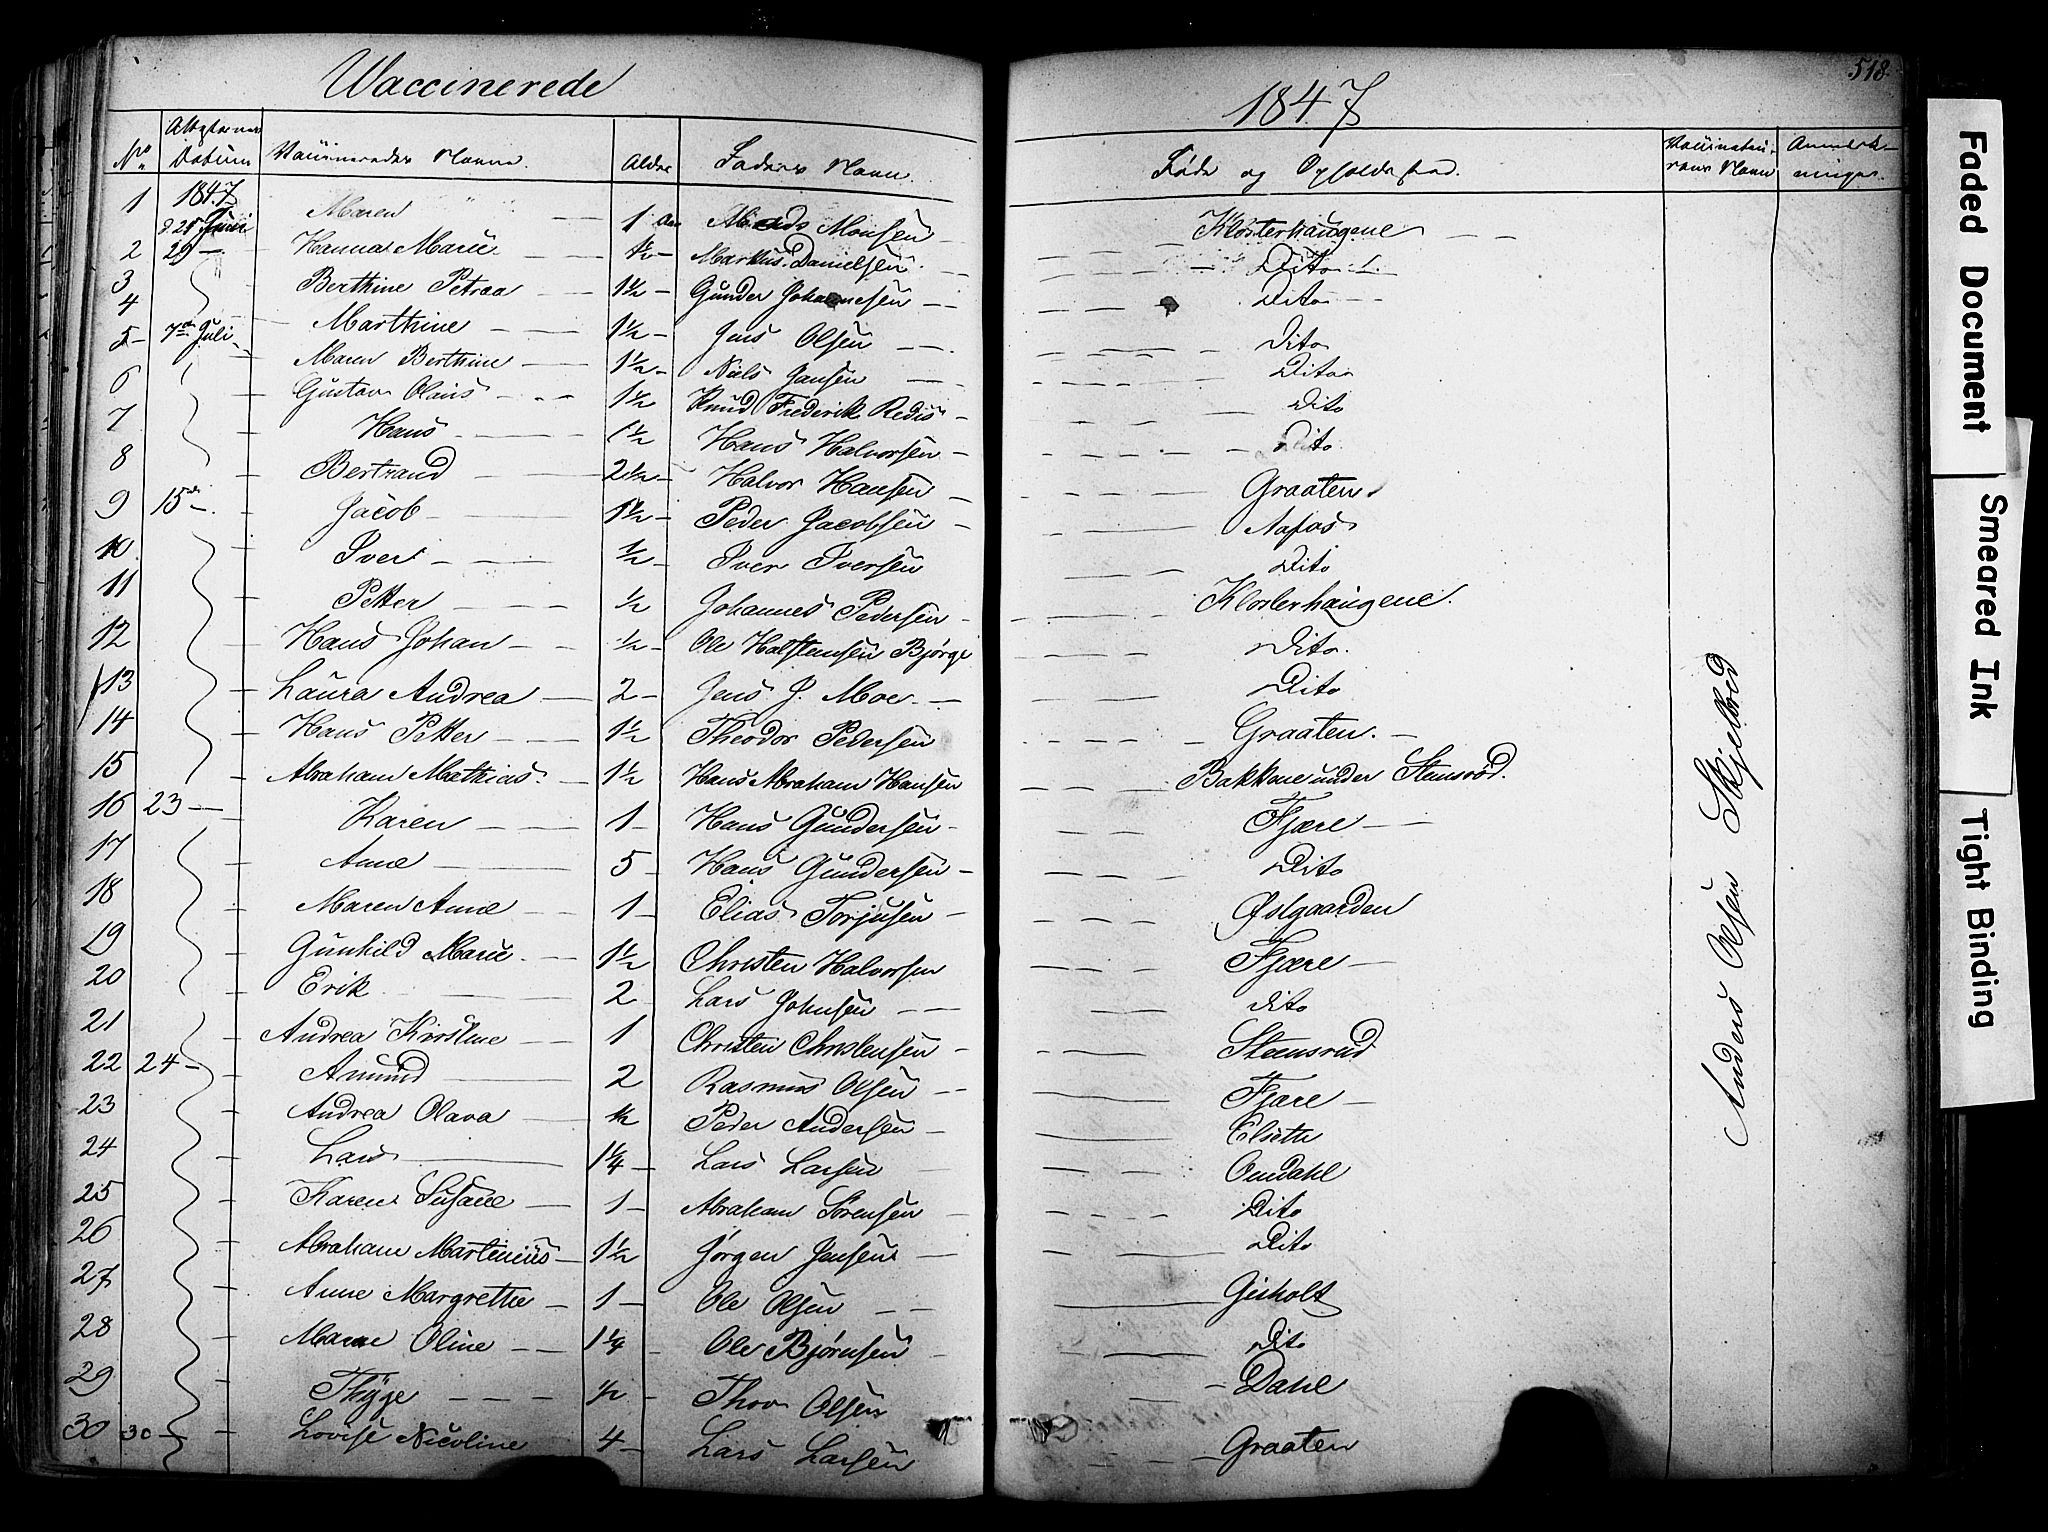 SAKO, Solum kirkebøker, F/Fa/L0006: Ministerialbok nr. I 6, 1844-1855, s. 518